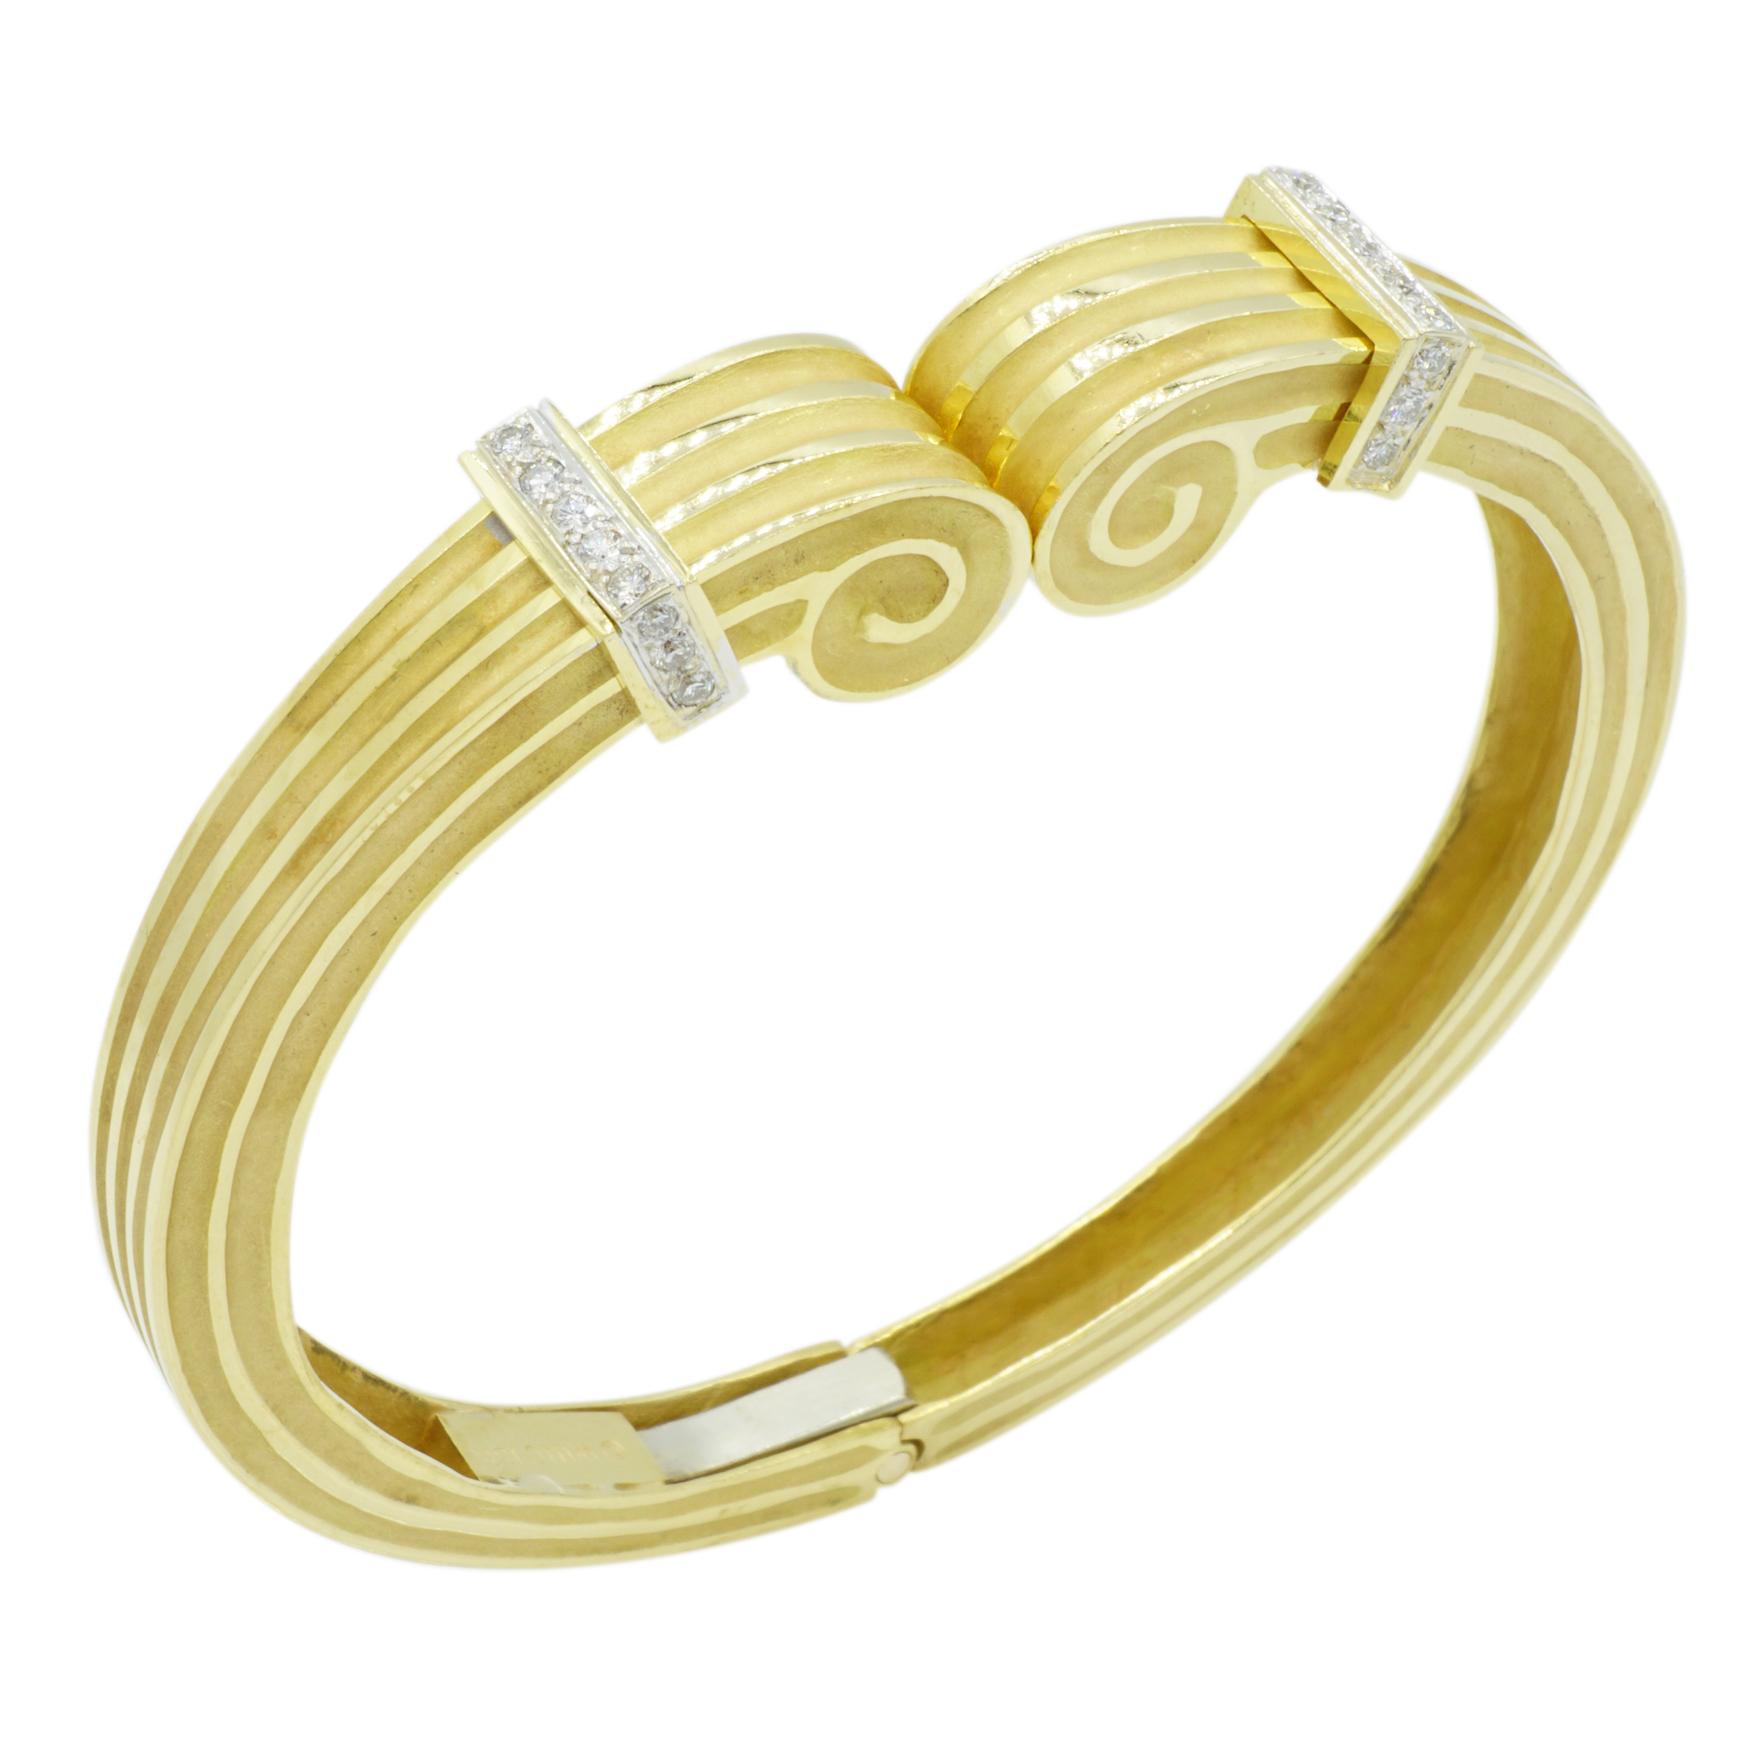 14kt Yellow Gold and Diamond Bracelet